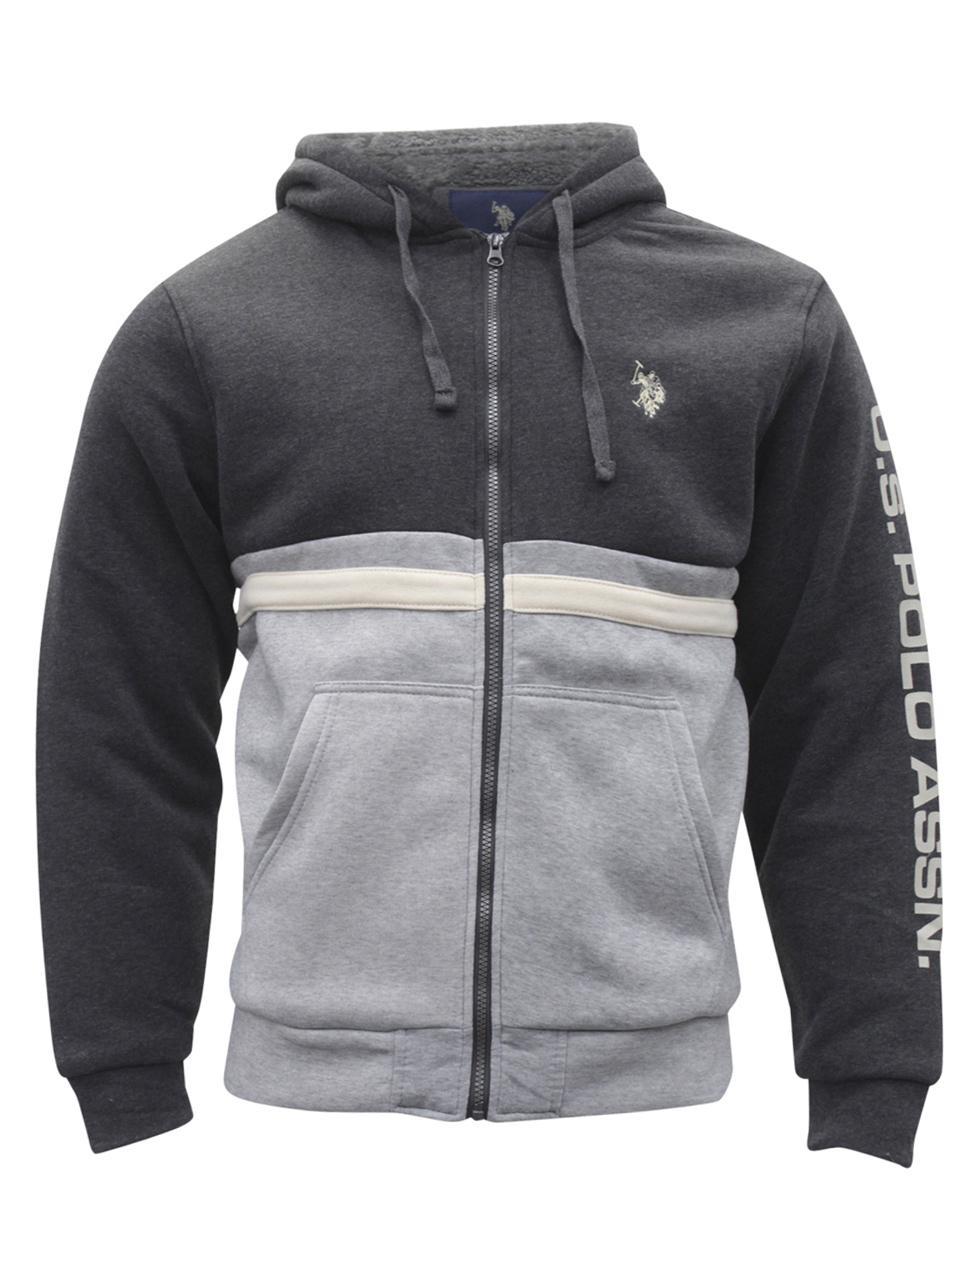 Polo Association Men/'s Basic Zip Front Hooded Vest U.S